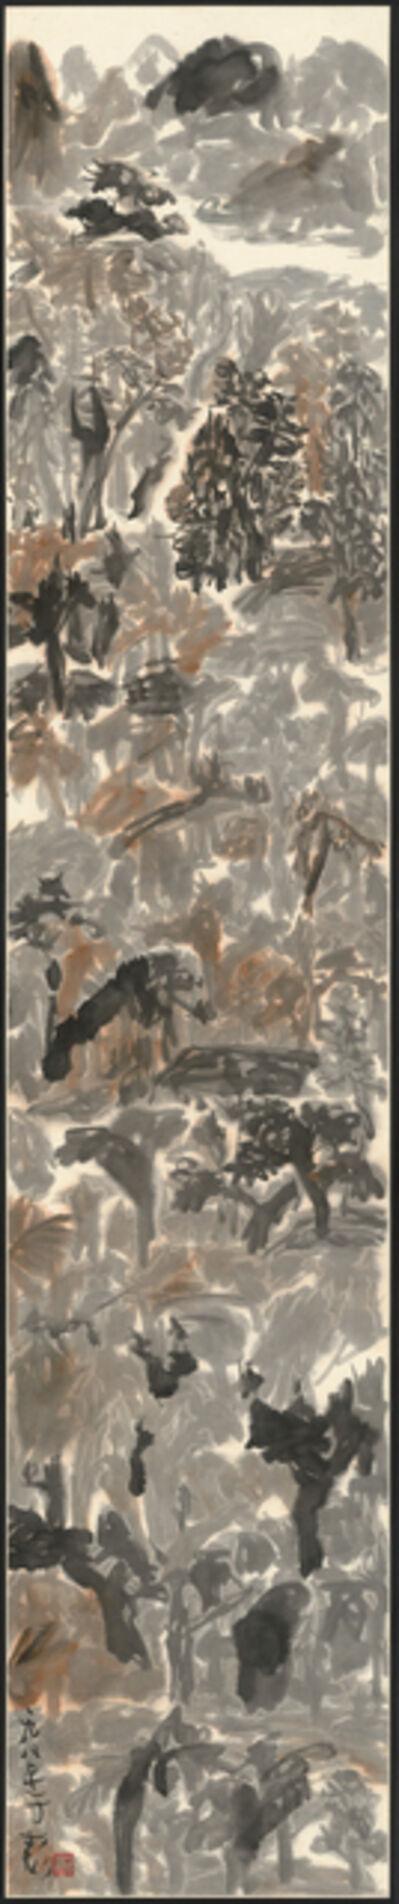 Yu Peng (TAIWANESE, 1955-2014), 'Magnificent Landscape', 1988